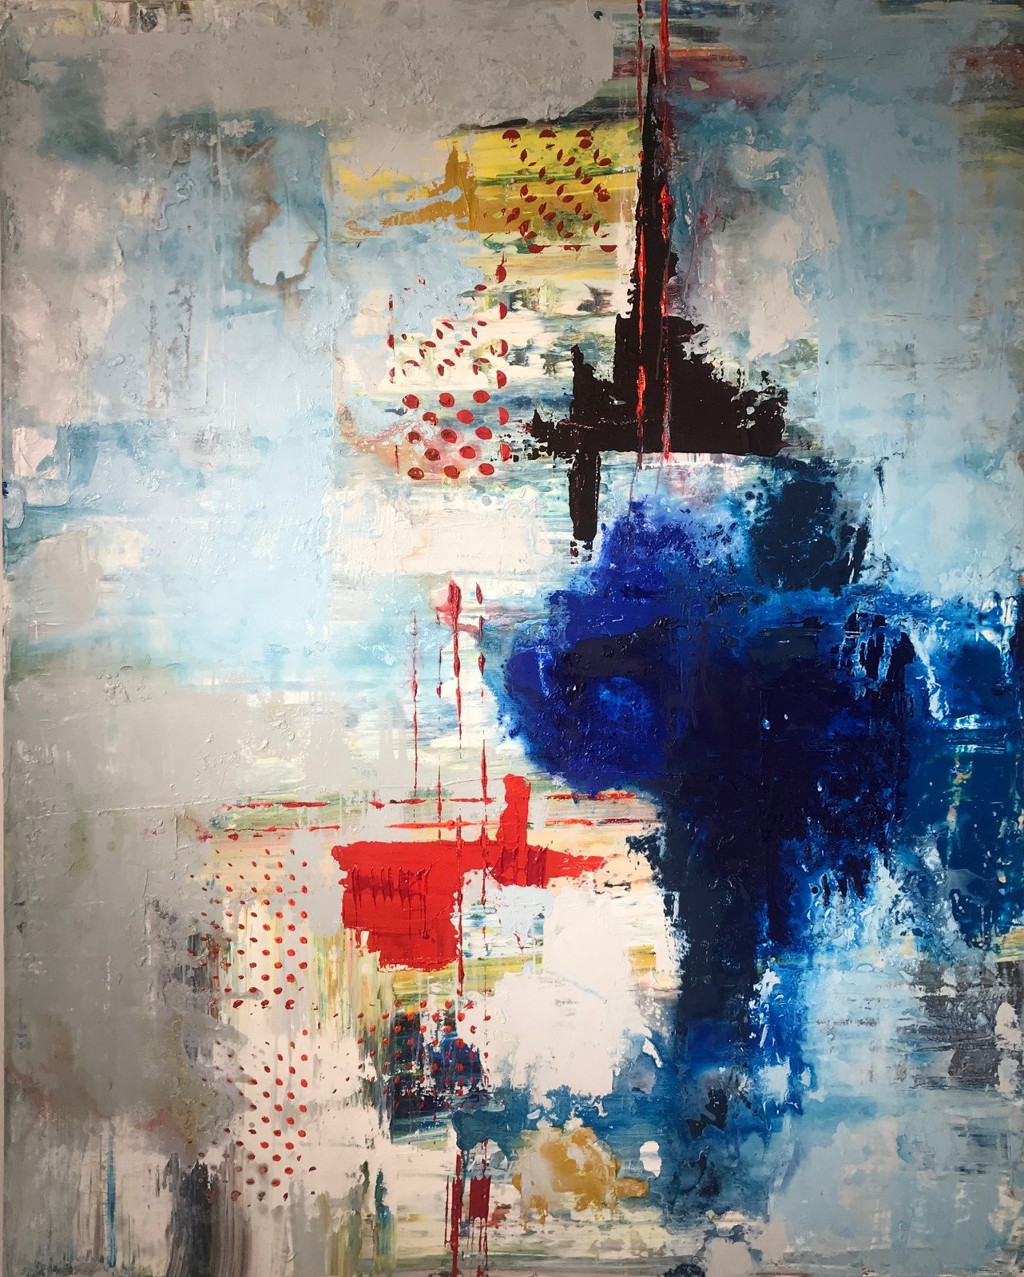 Energia #1 by John Schuyler